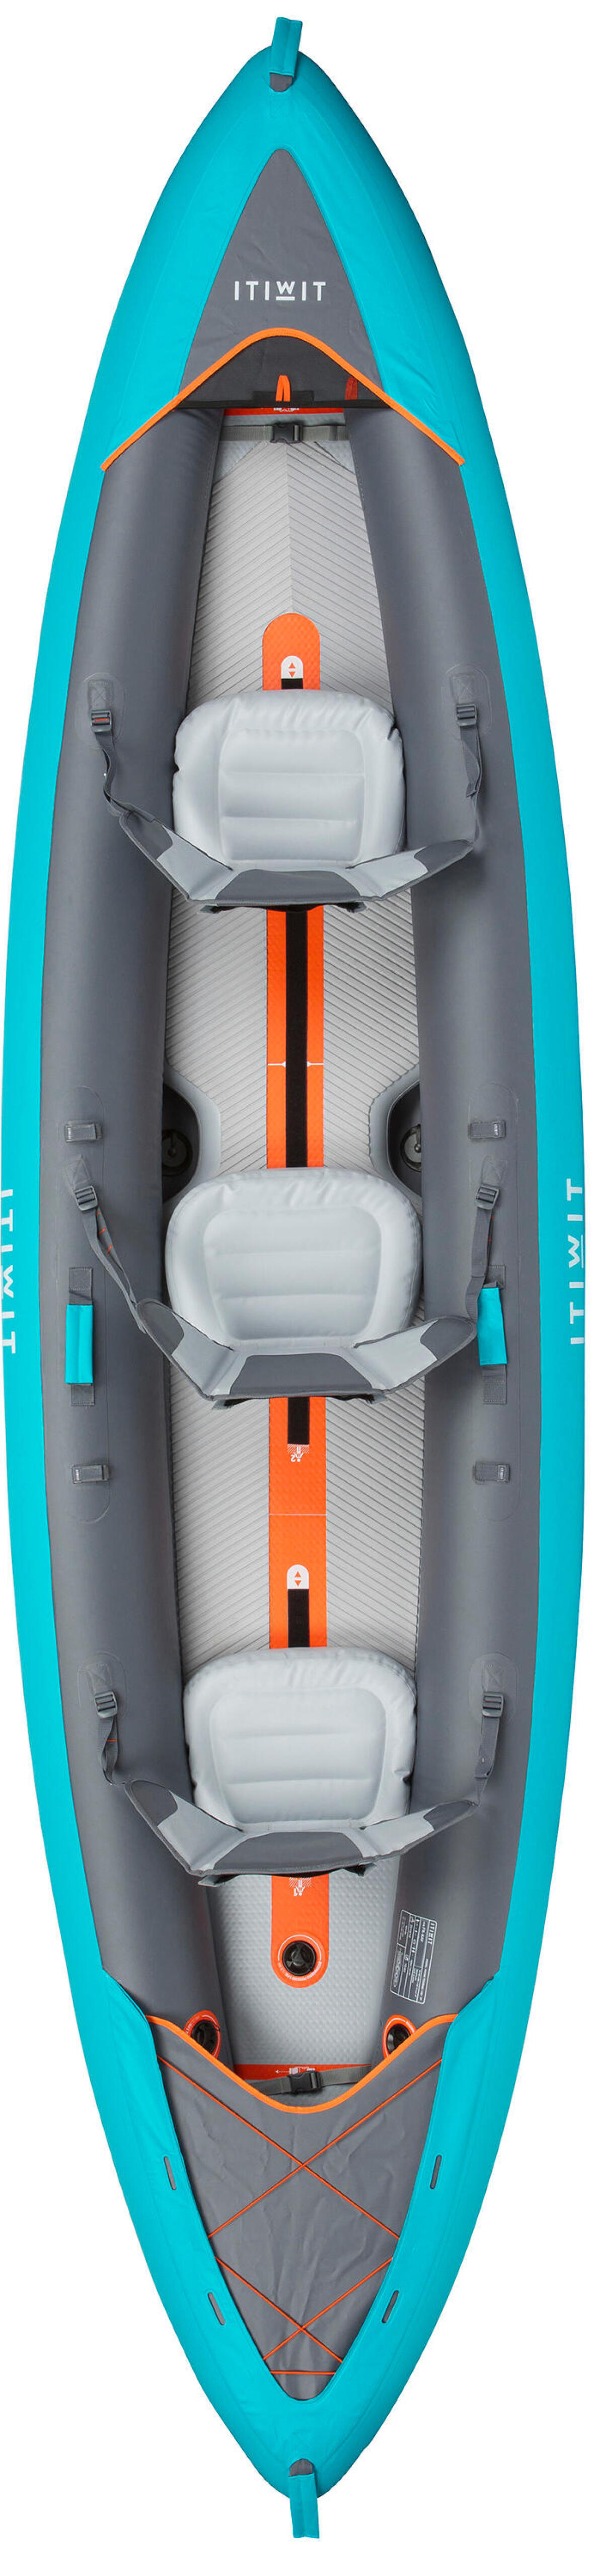 kayak_gonflable_randonnee-fundo-ap-droptstitch-3-lugares-itiwit-azul-decathlon